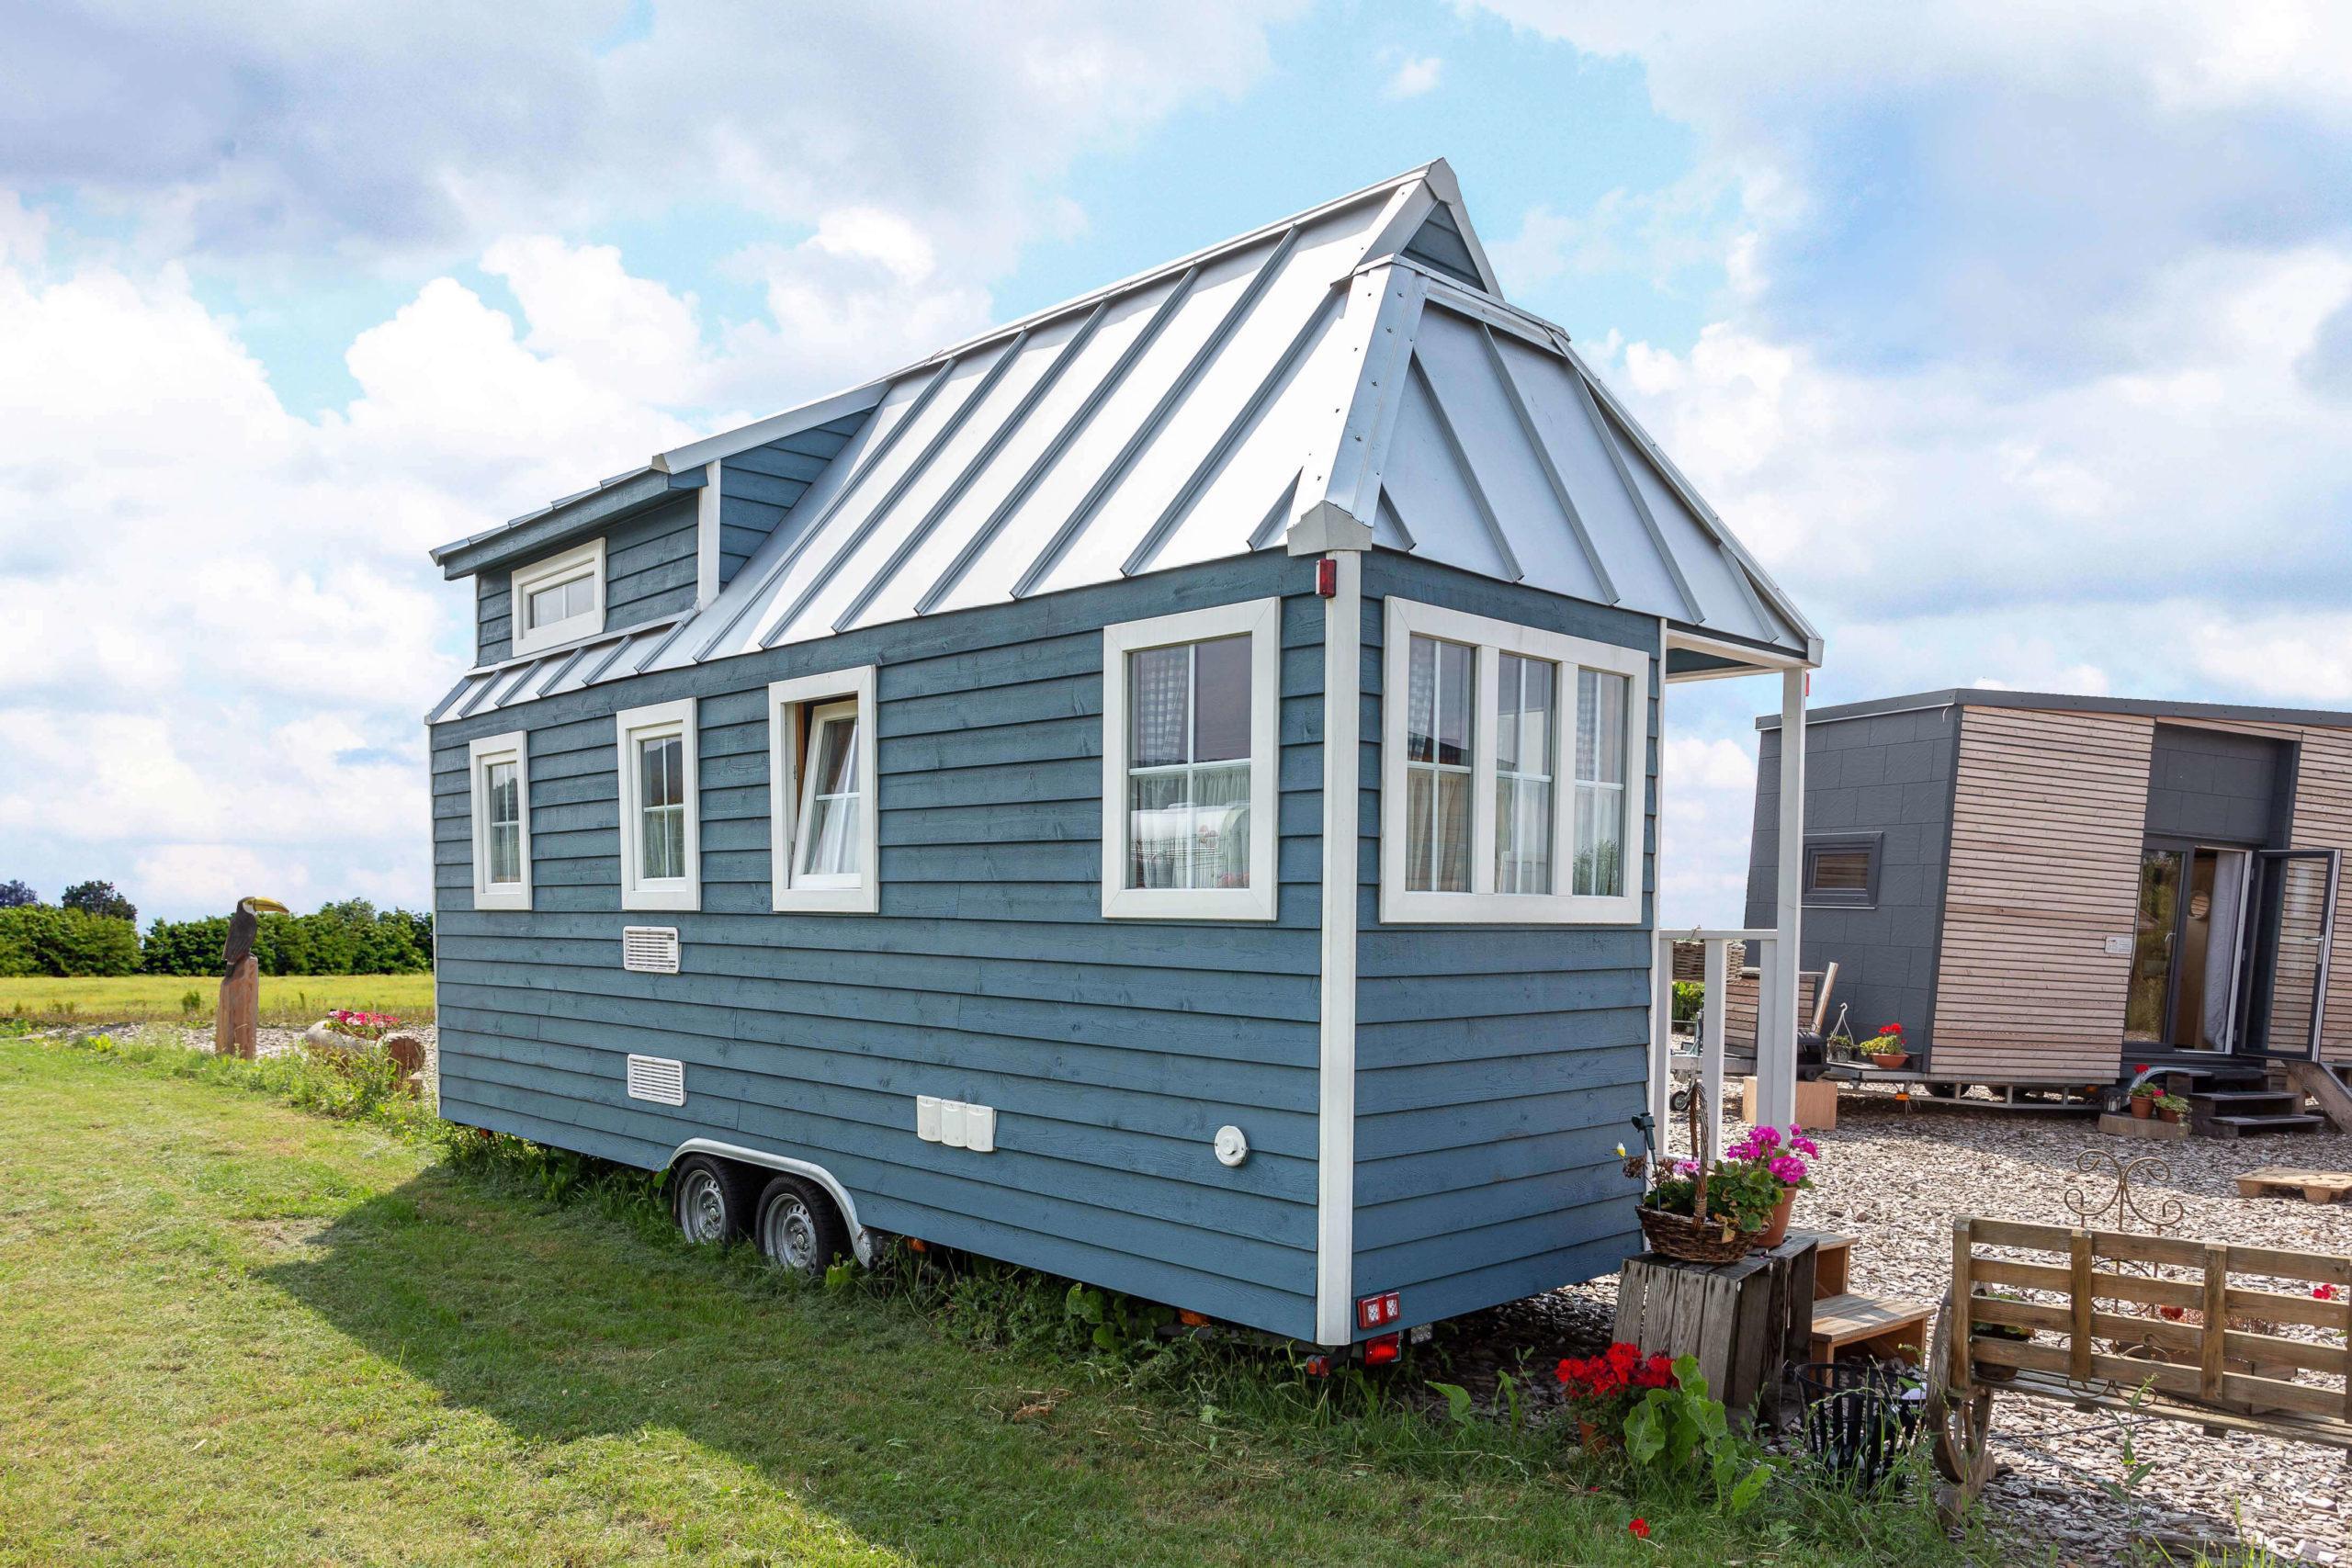 mobiles-tiny-house-island-vital-camp-gmbh-03